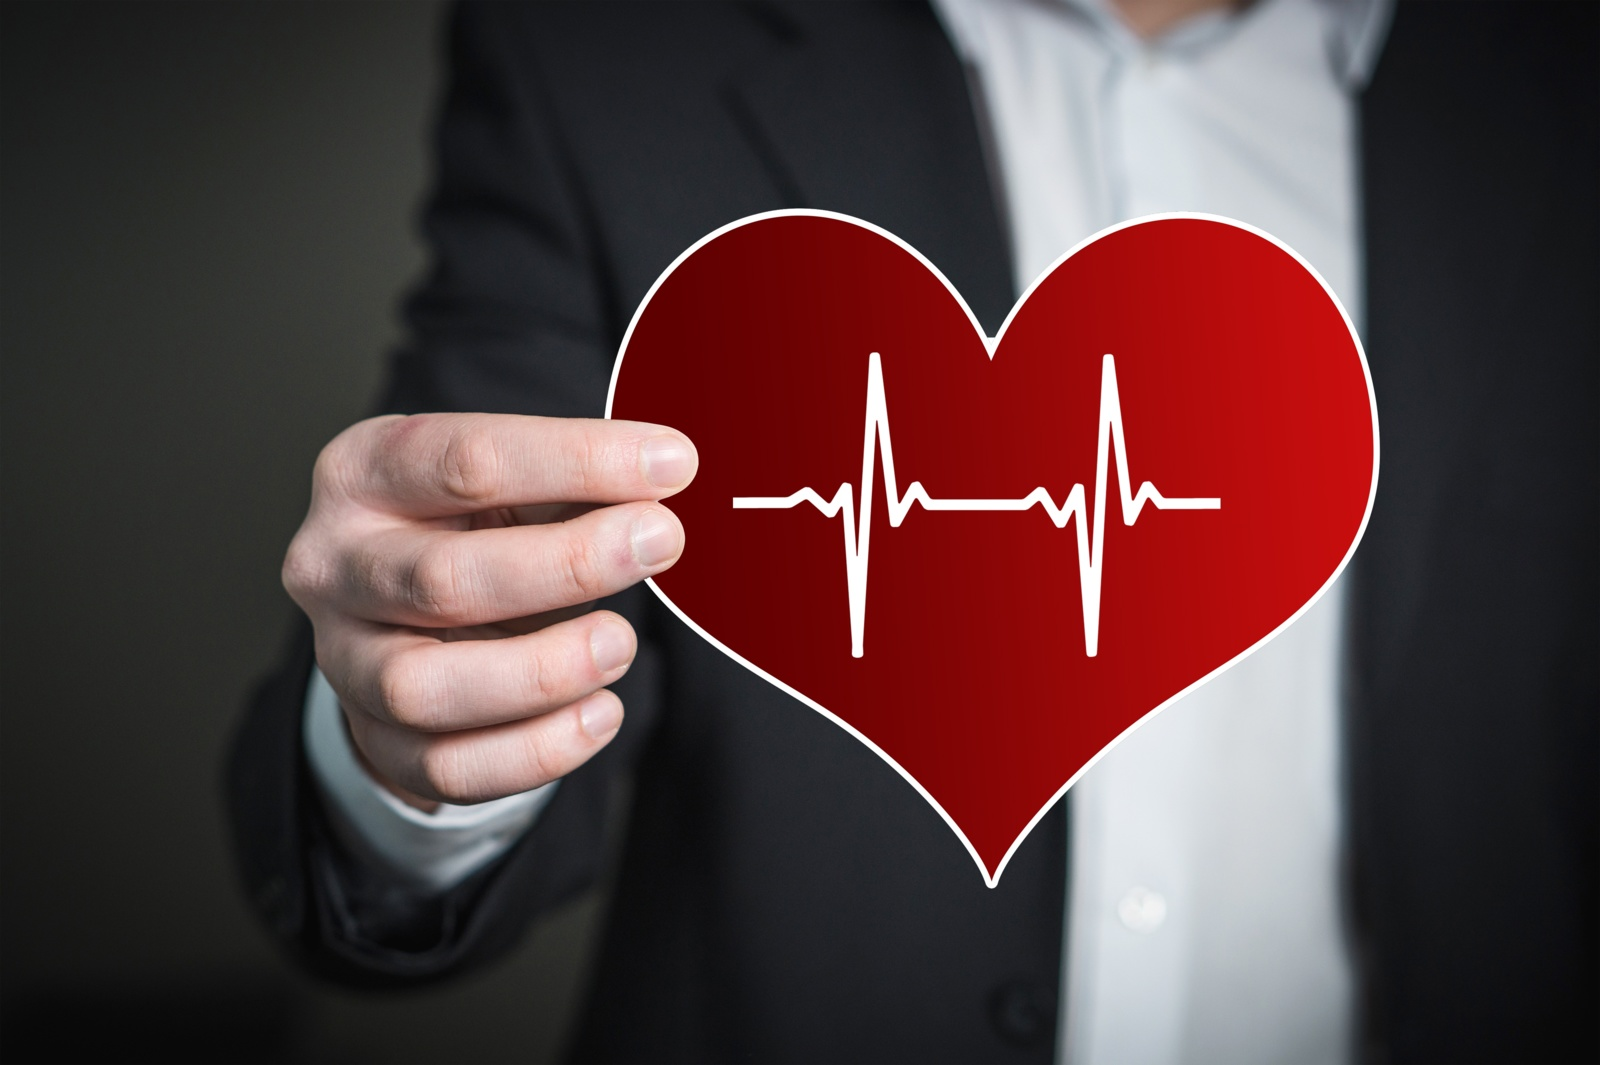 hipertenzija pasirinkti vaistus